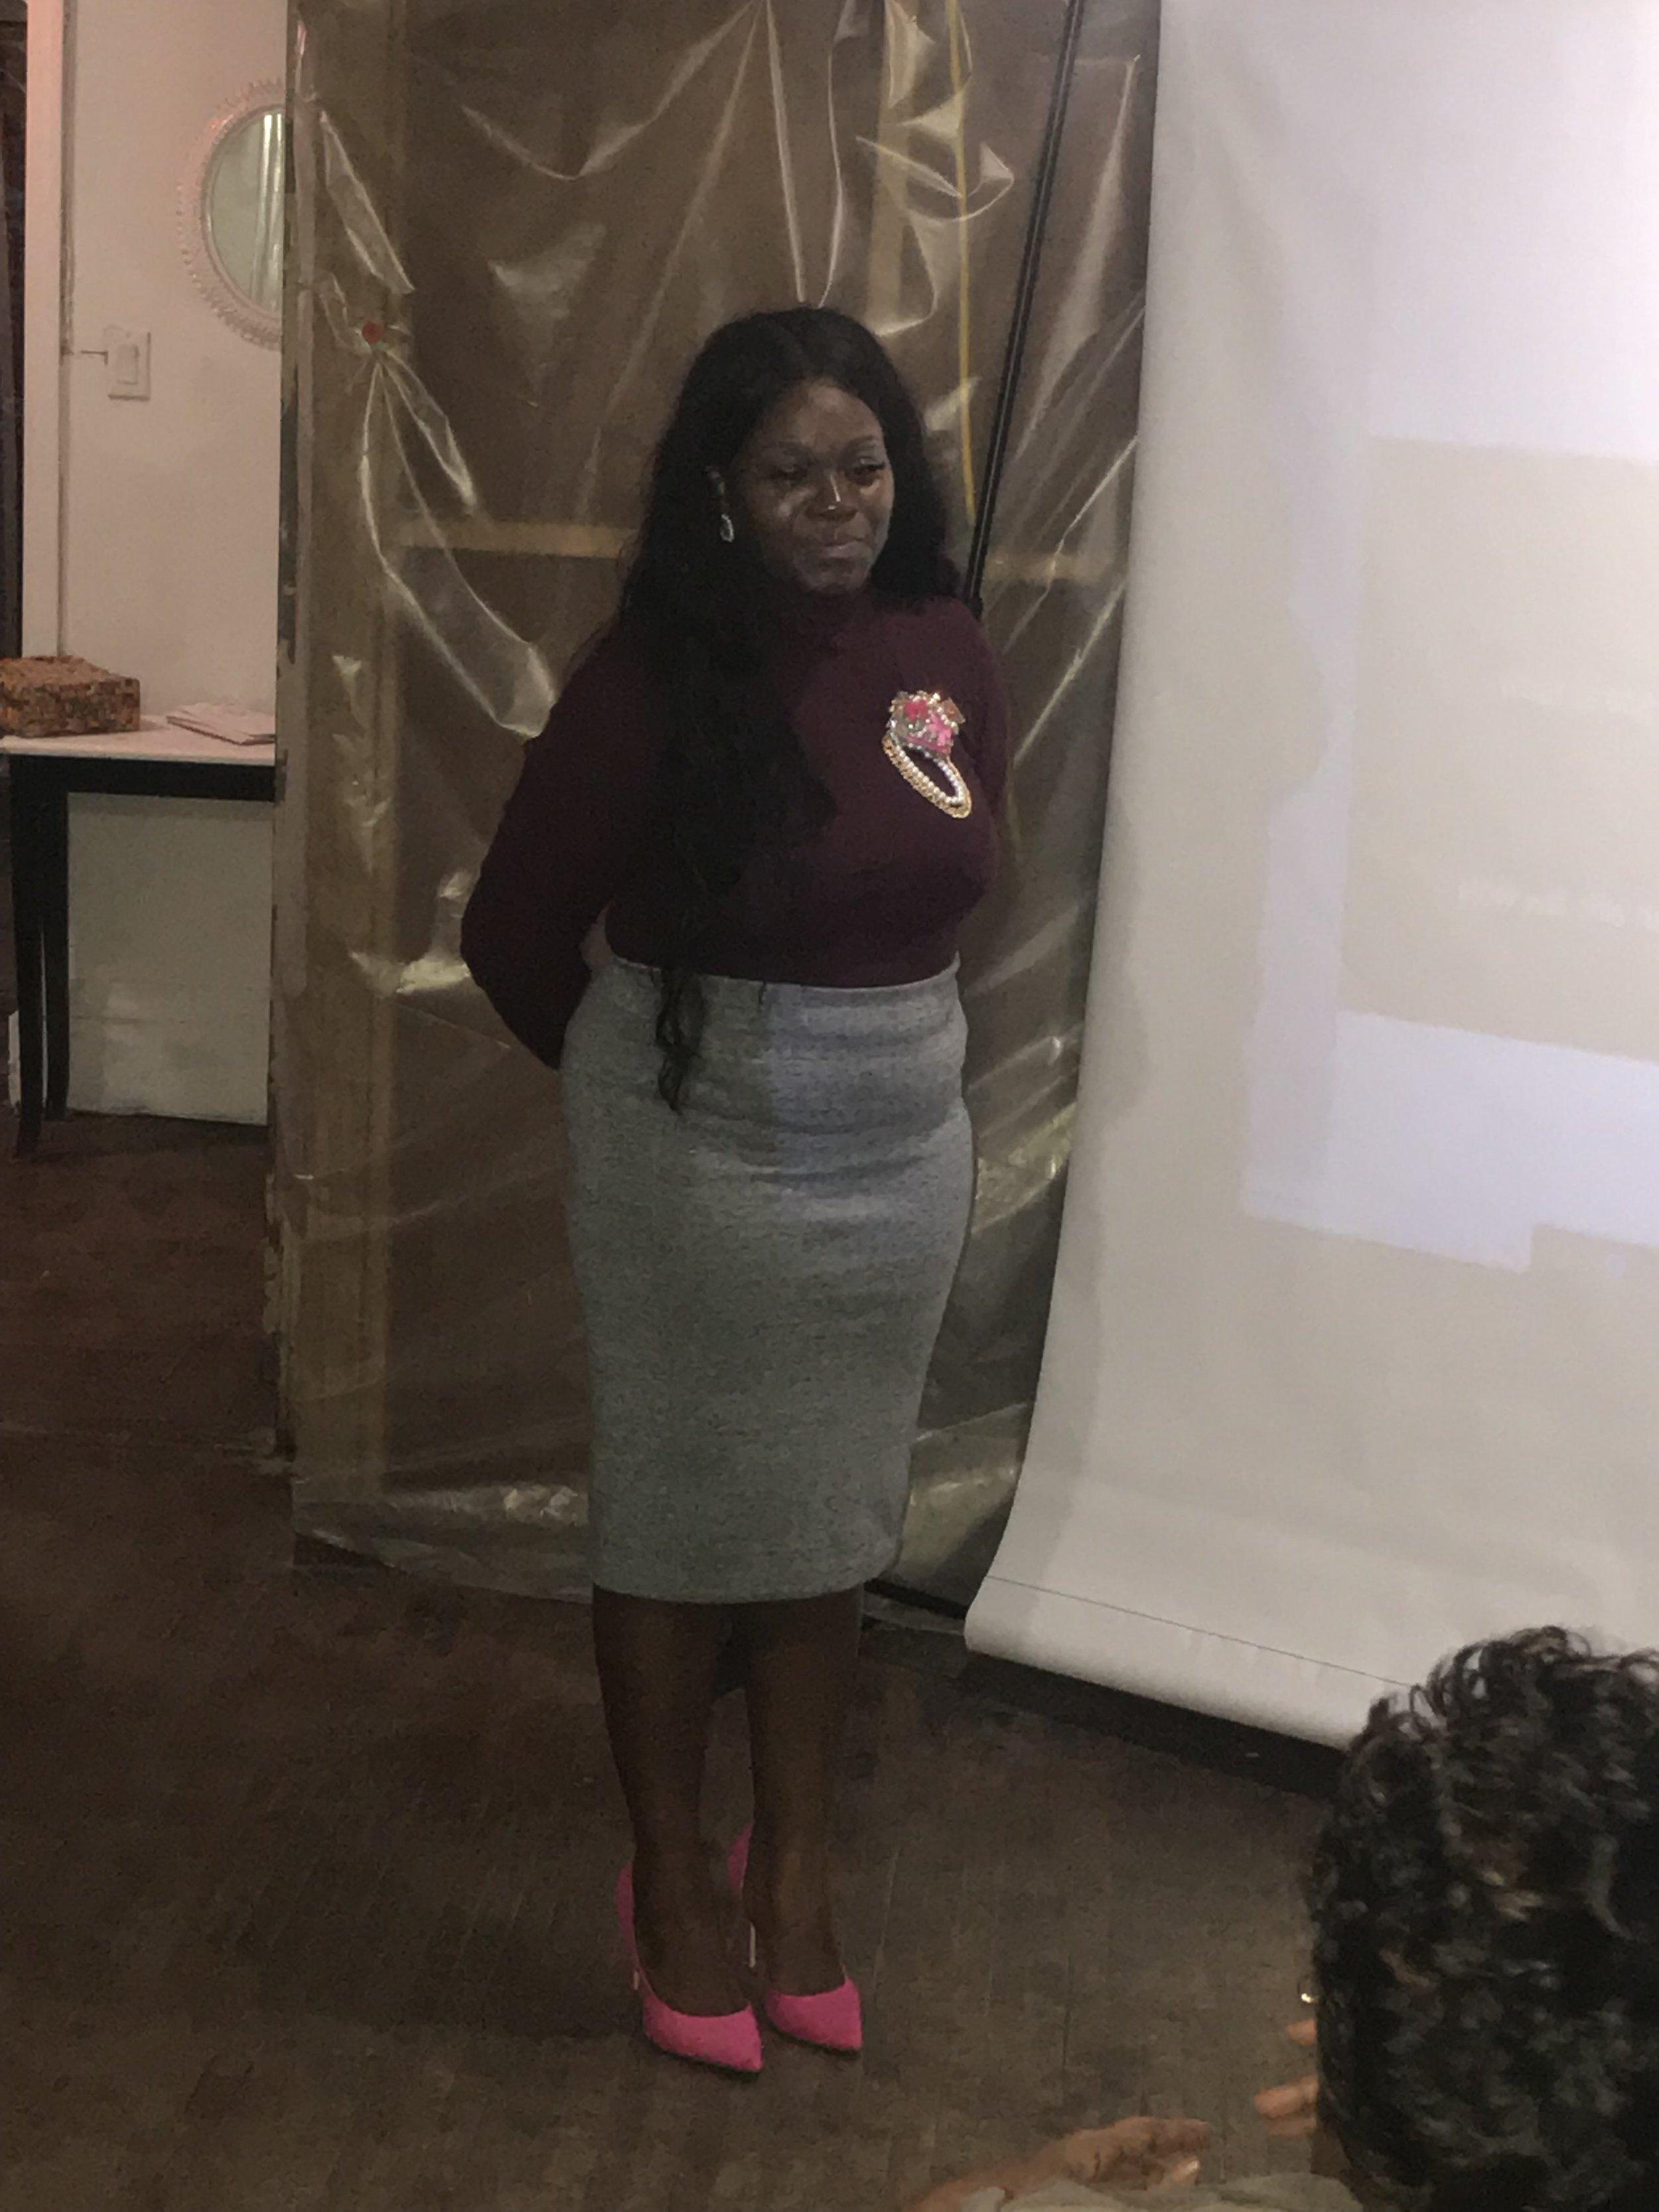 Women EmpowermentPilot Session #1 - Childhood vs. Adulthood